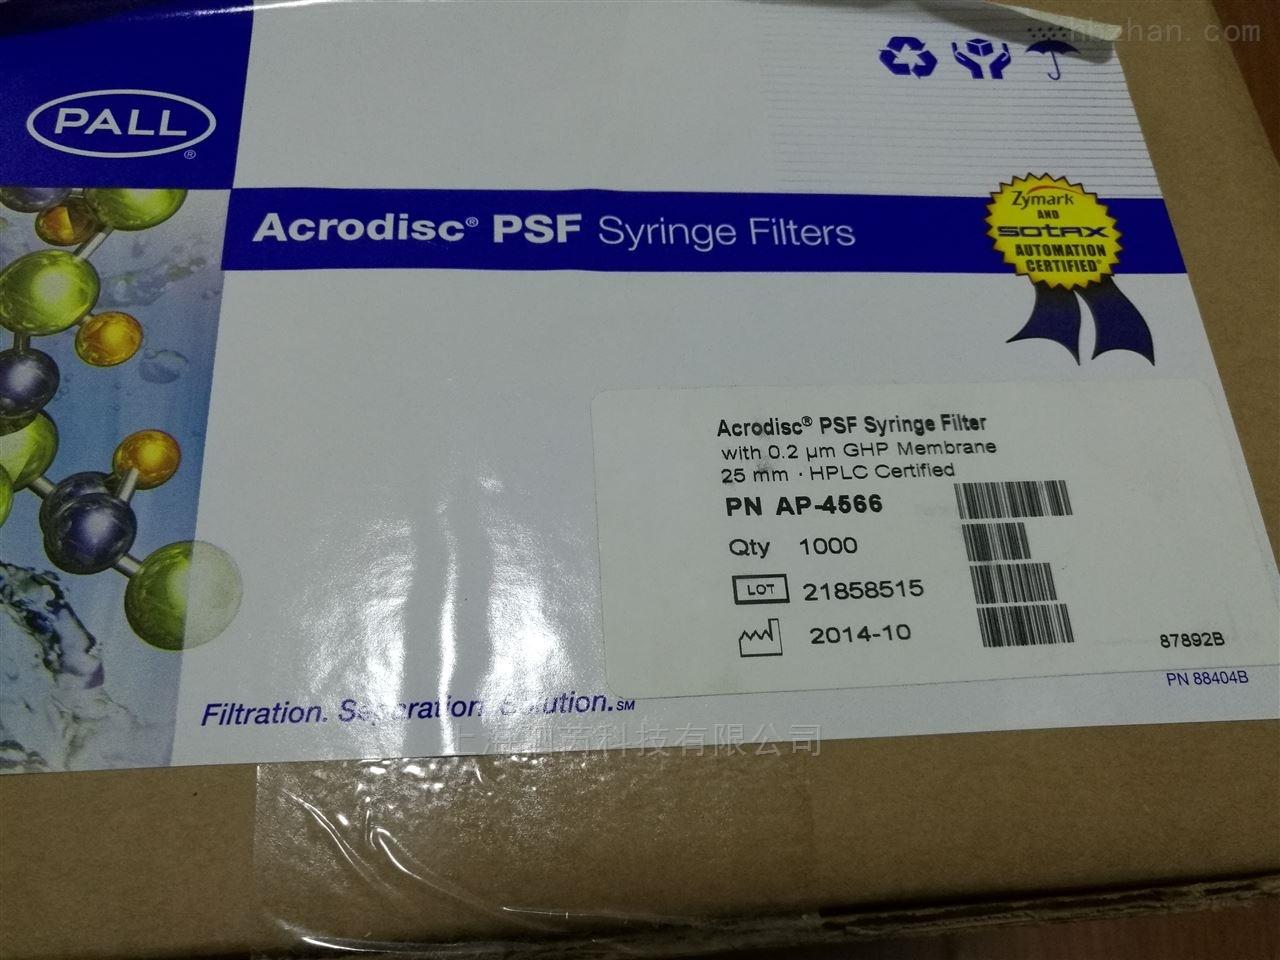 pall针头式过滤器AP-4566